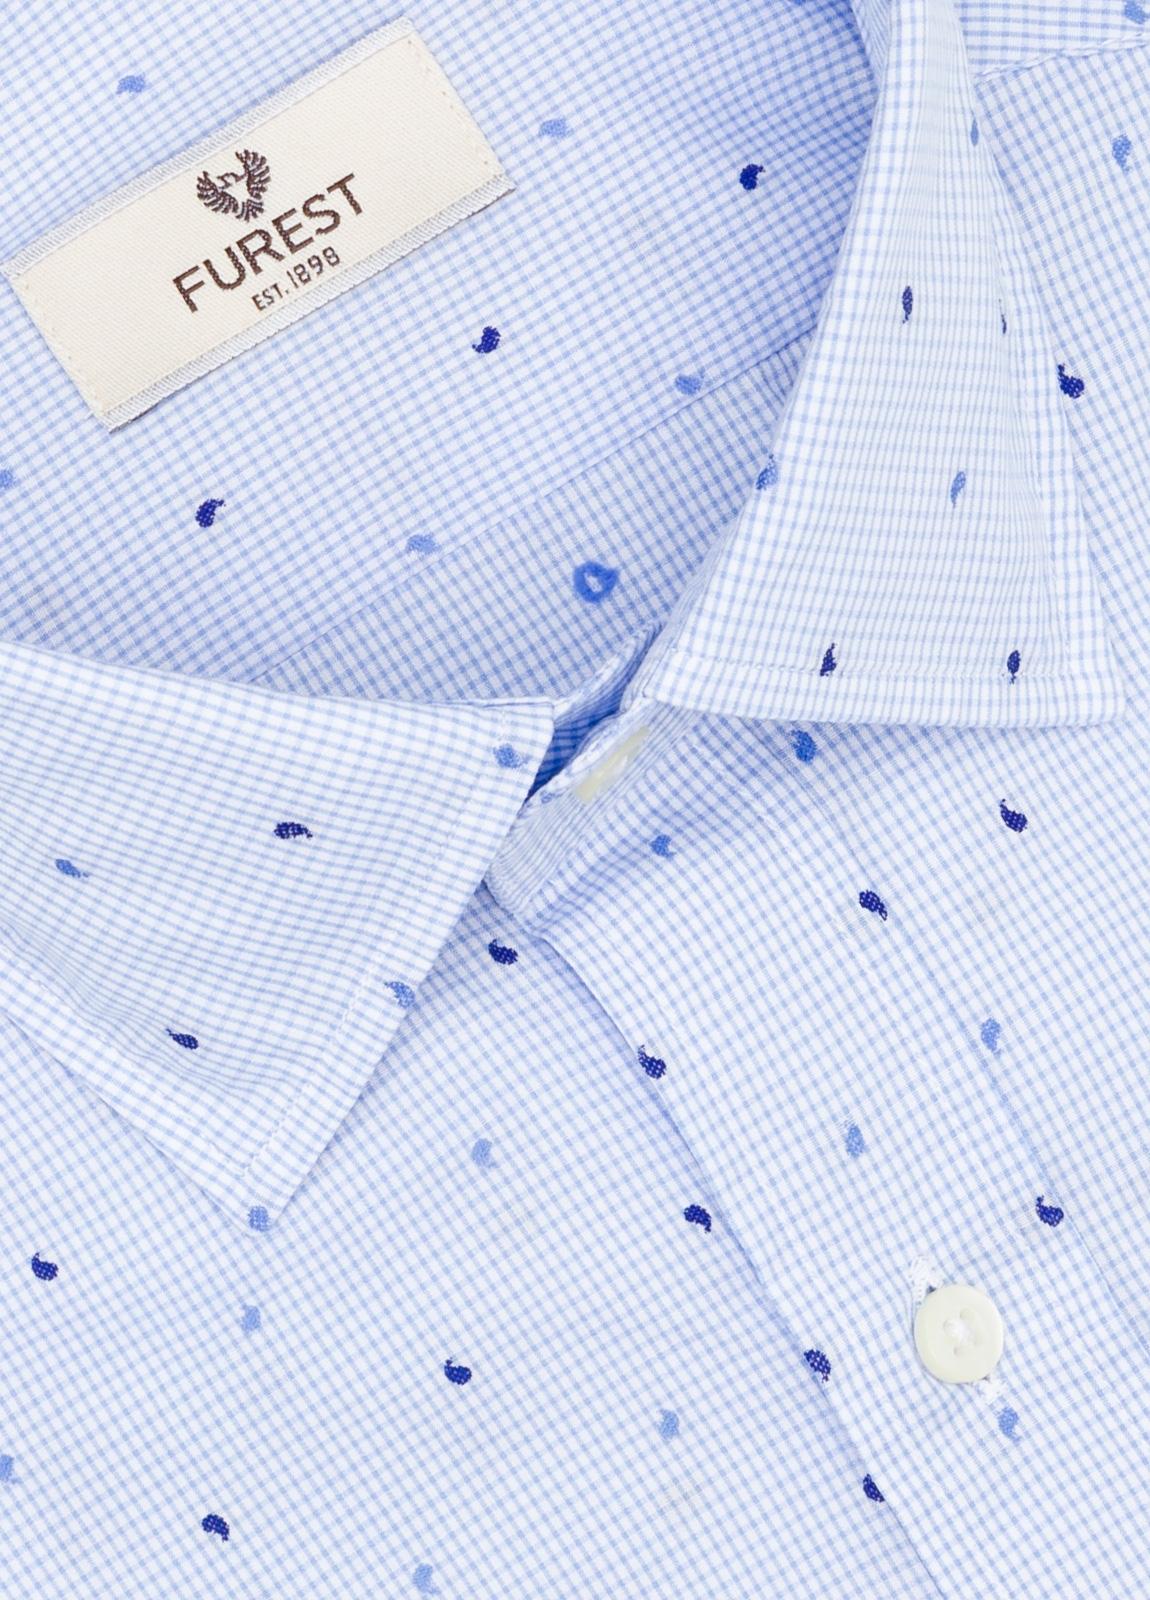 Camisa Leisure Wear SLIM FIT modelo PORTO microestampado color celeste. 100% Algodón. - Ítem2